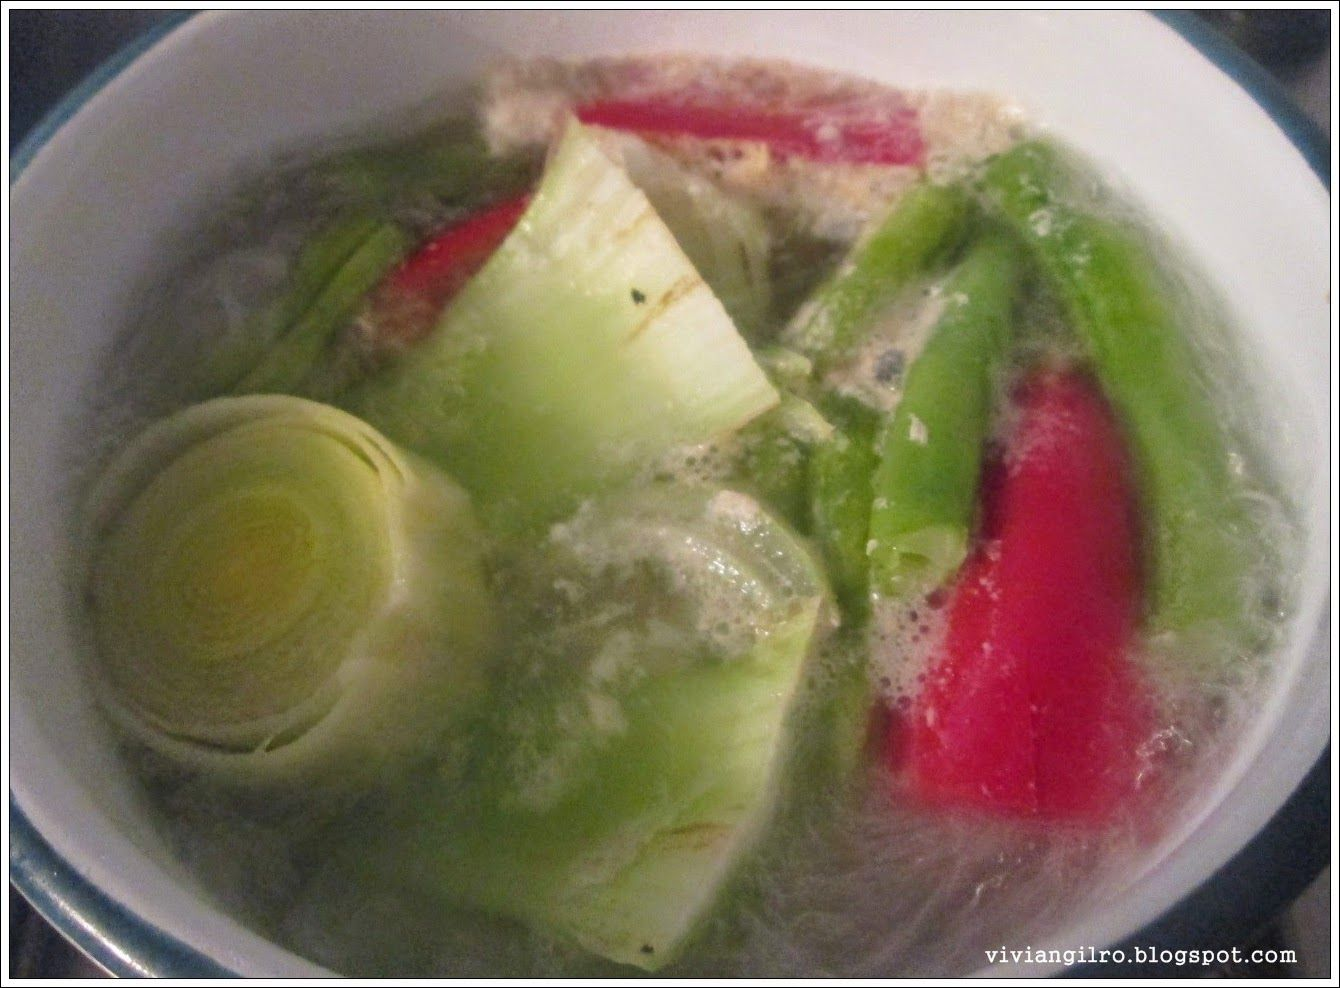 Receta saludable - Sopa campesina en http://viviangilro.blogspot.com/2014/08/receta-saludable-sopa-campesina.html